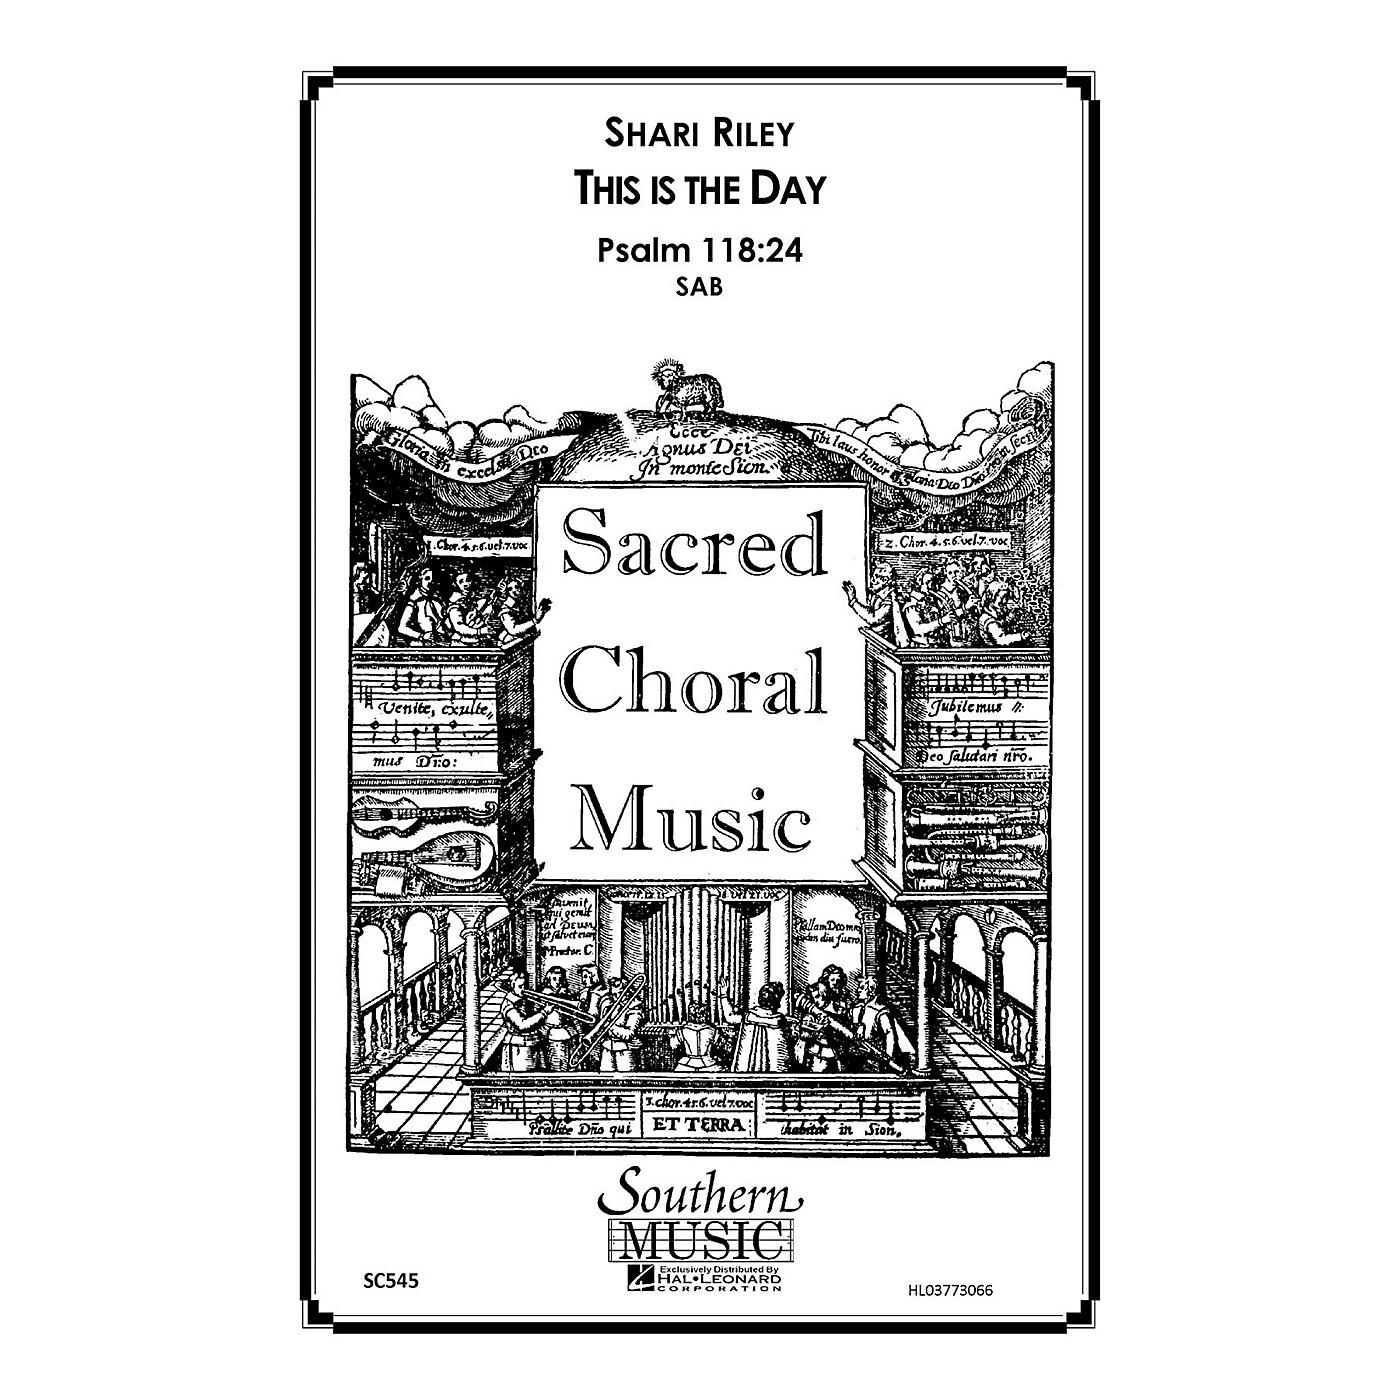 Hal Leonard This Is the Day (Choral Music/Octavo Sacred Sab) SAB Composed by Riley, Shari thumbnail